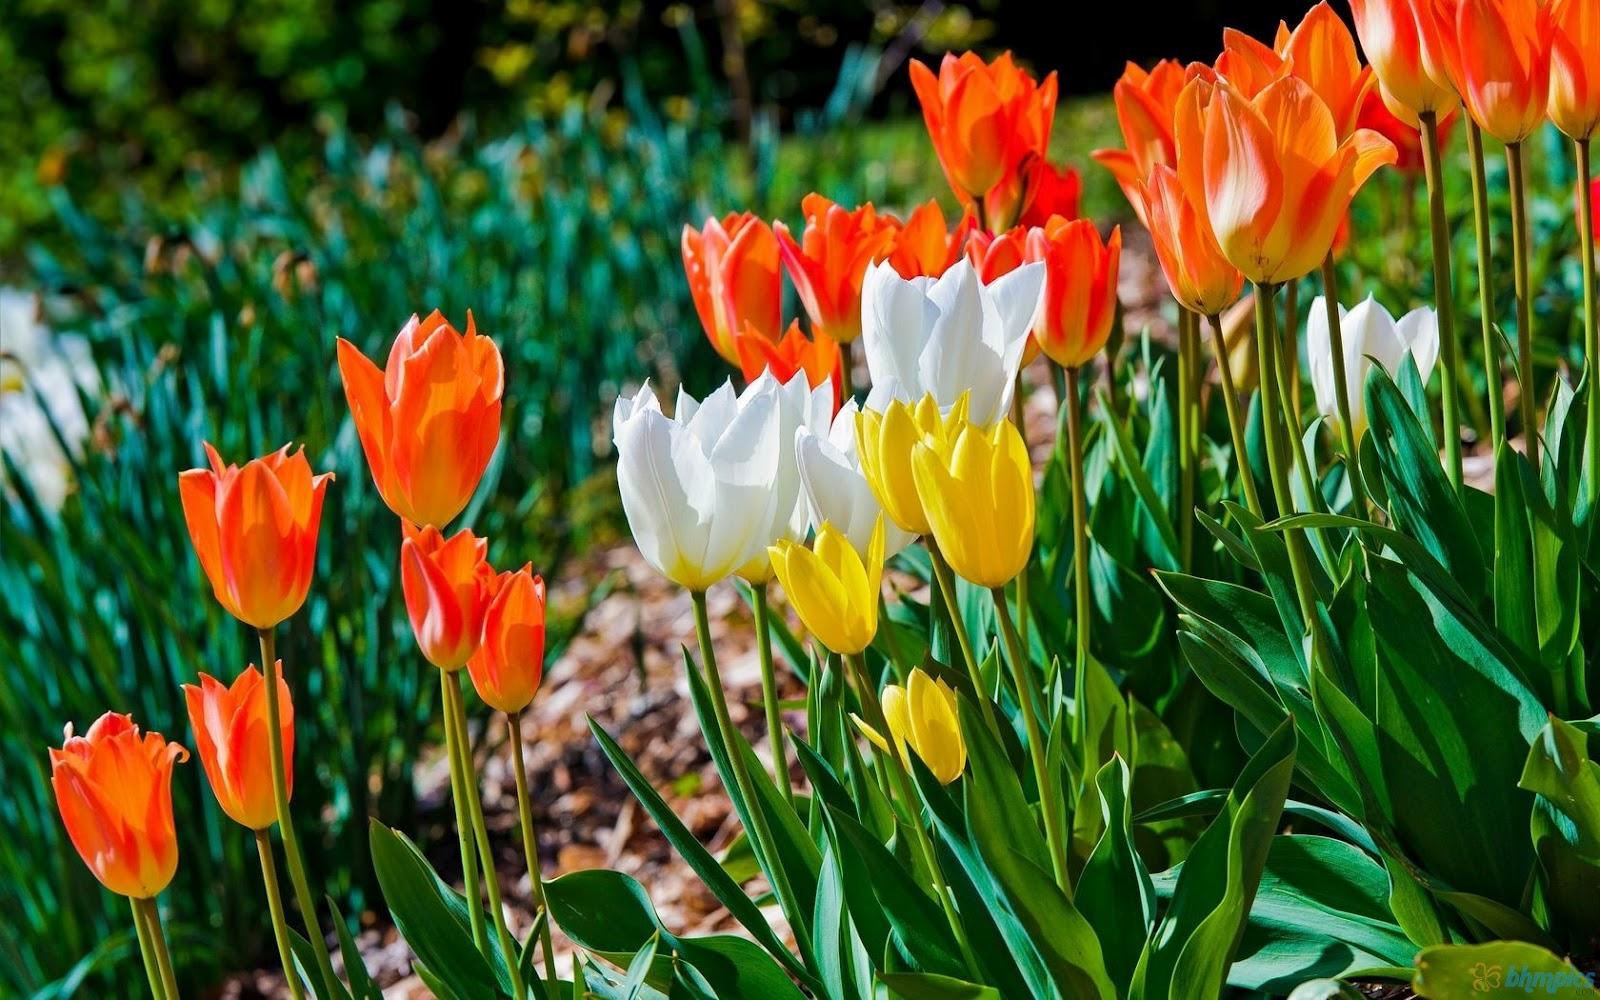 tulips garden wallpaper - photo #16